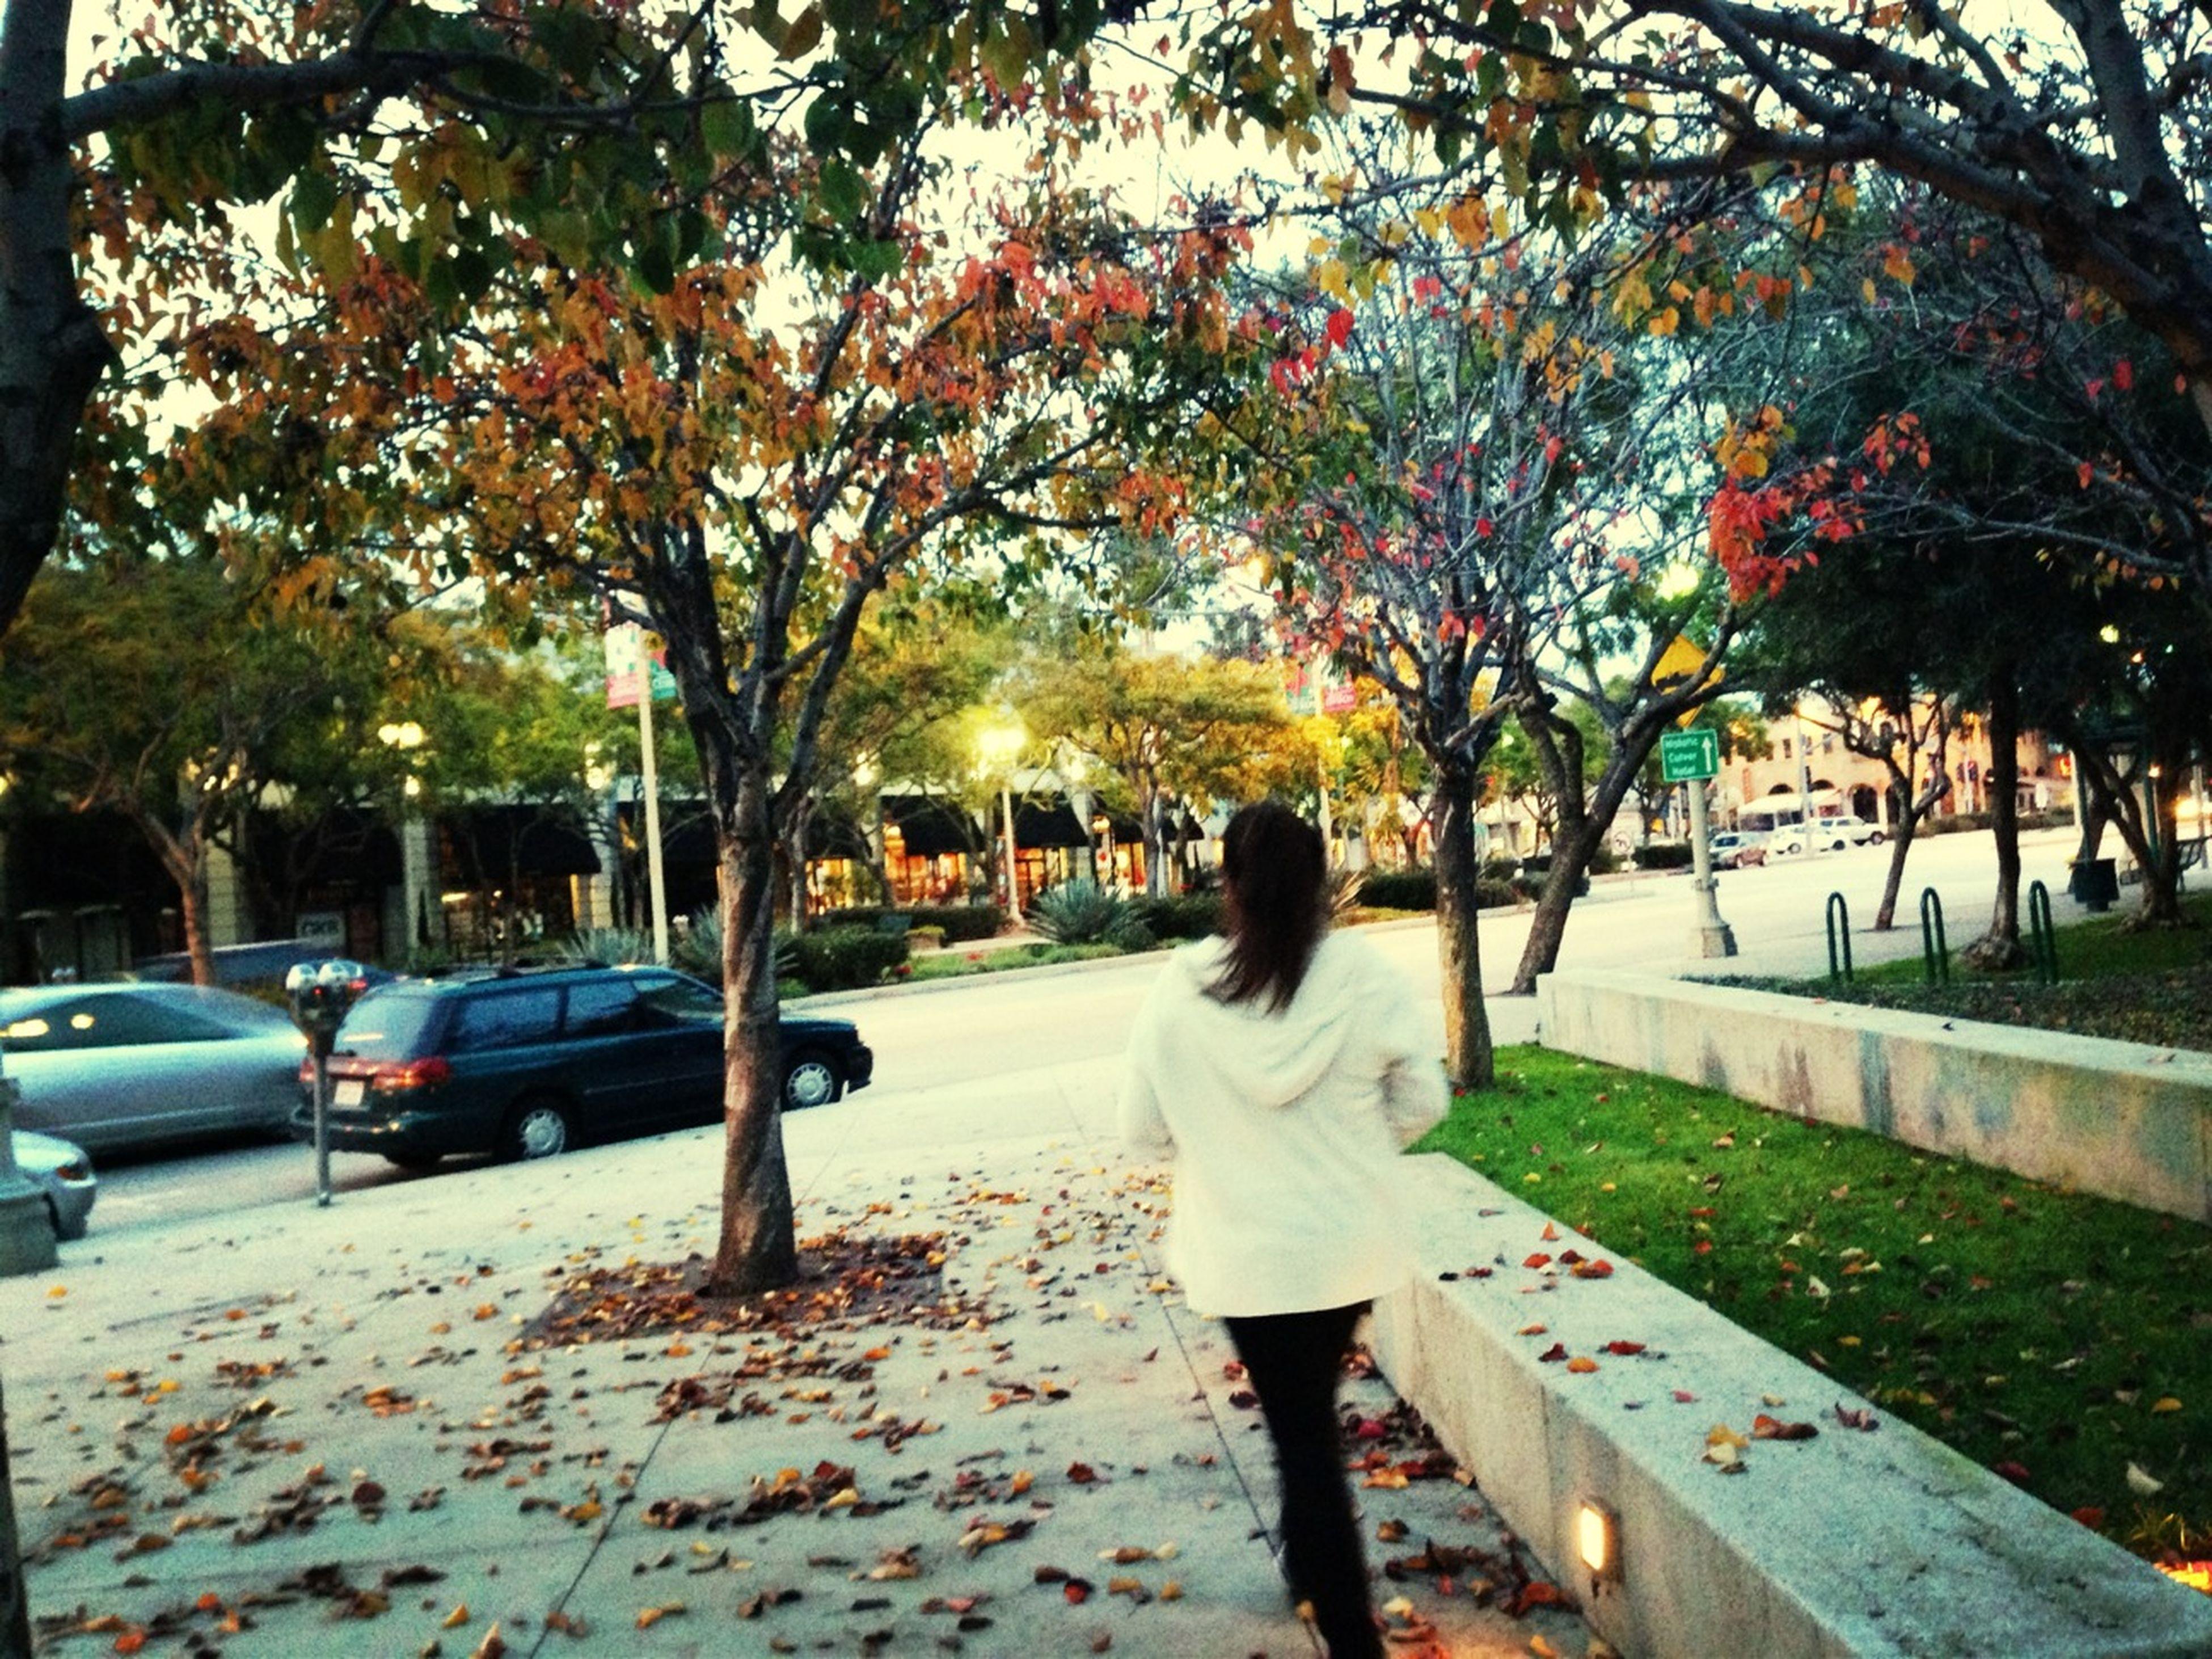 tree, street, transportation, road, lifestyles, season, car, men, rear view, walking, leisure activity, land vehicle, autumn, full length, sidewalk, mode of transport, person, park - man made space